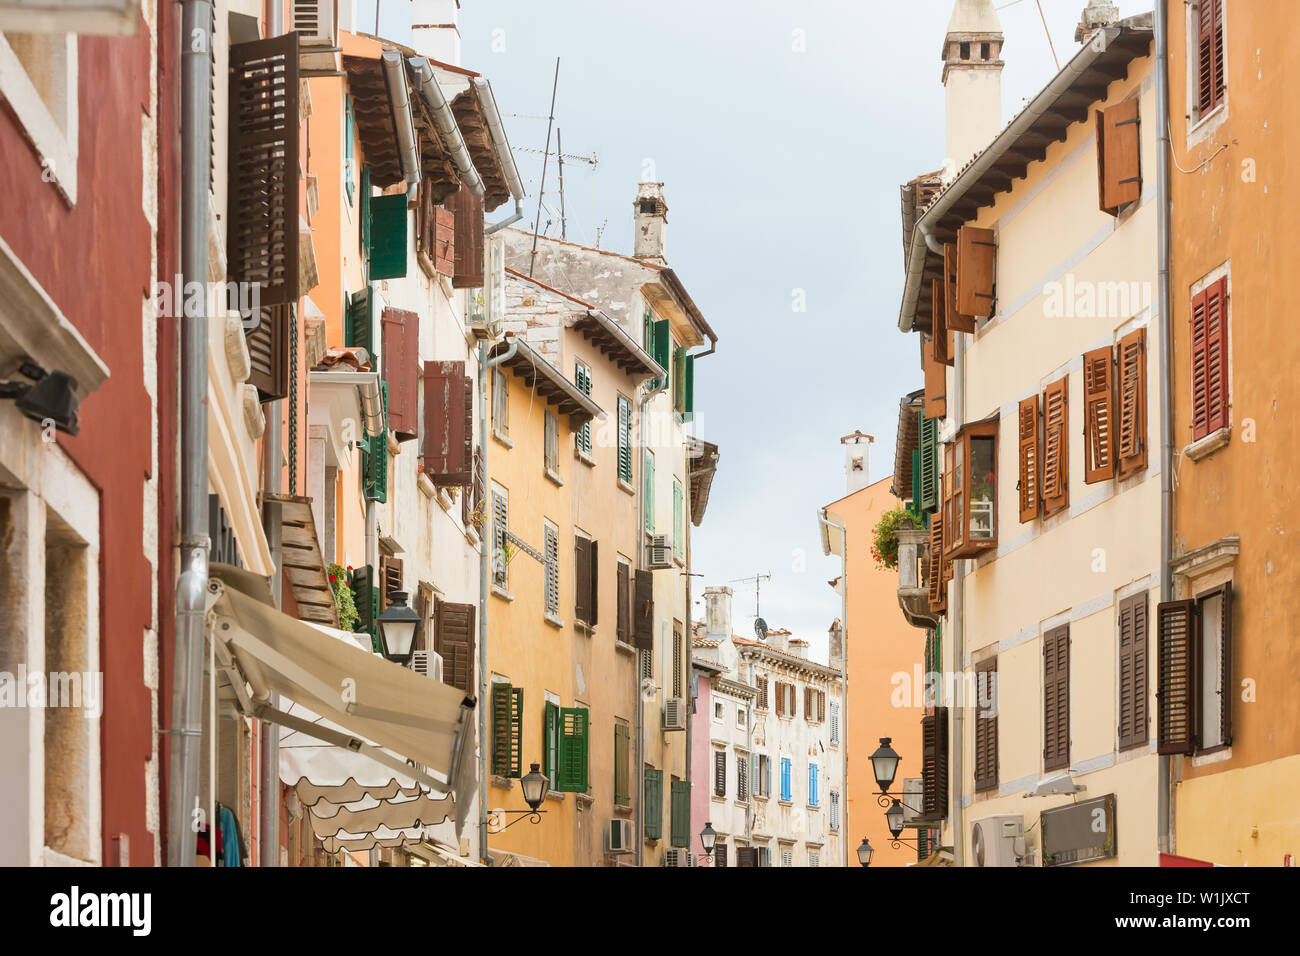 Rovinj, Istrien, Kroatien, Europa - Farbige Fassaden im Zentrum der Stadt Rovinj Stockfoto